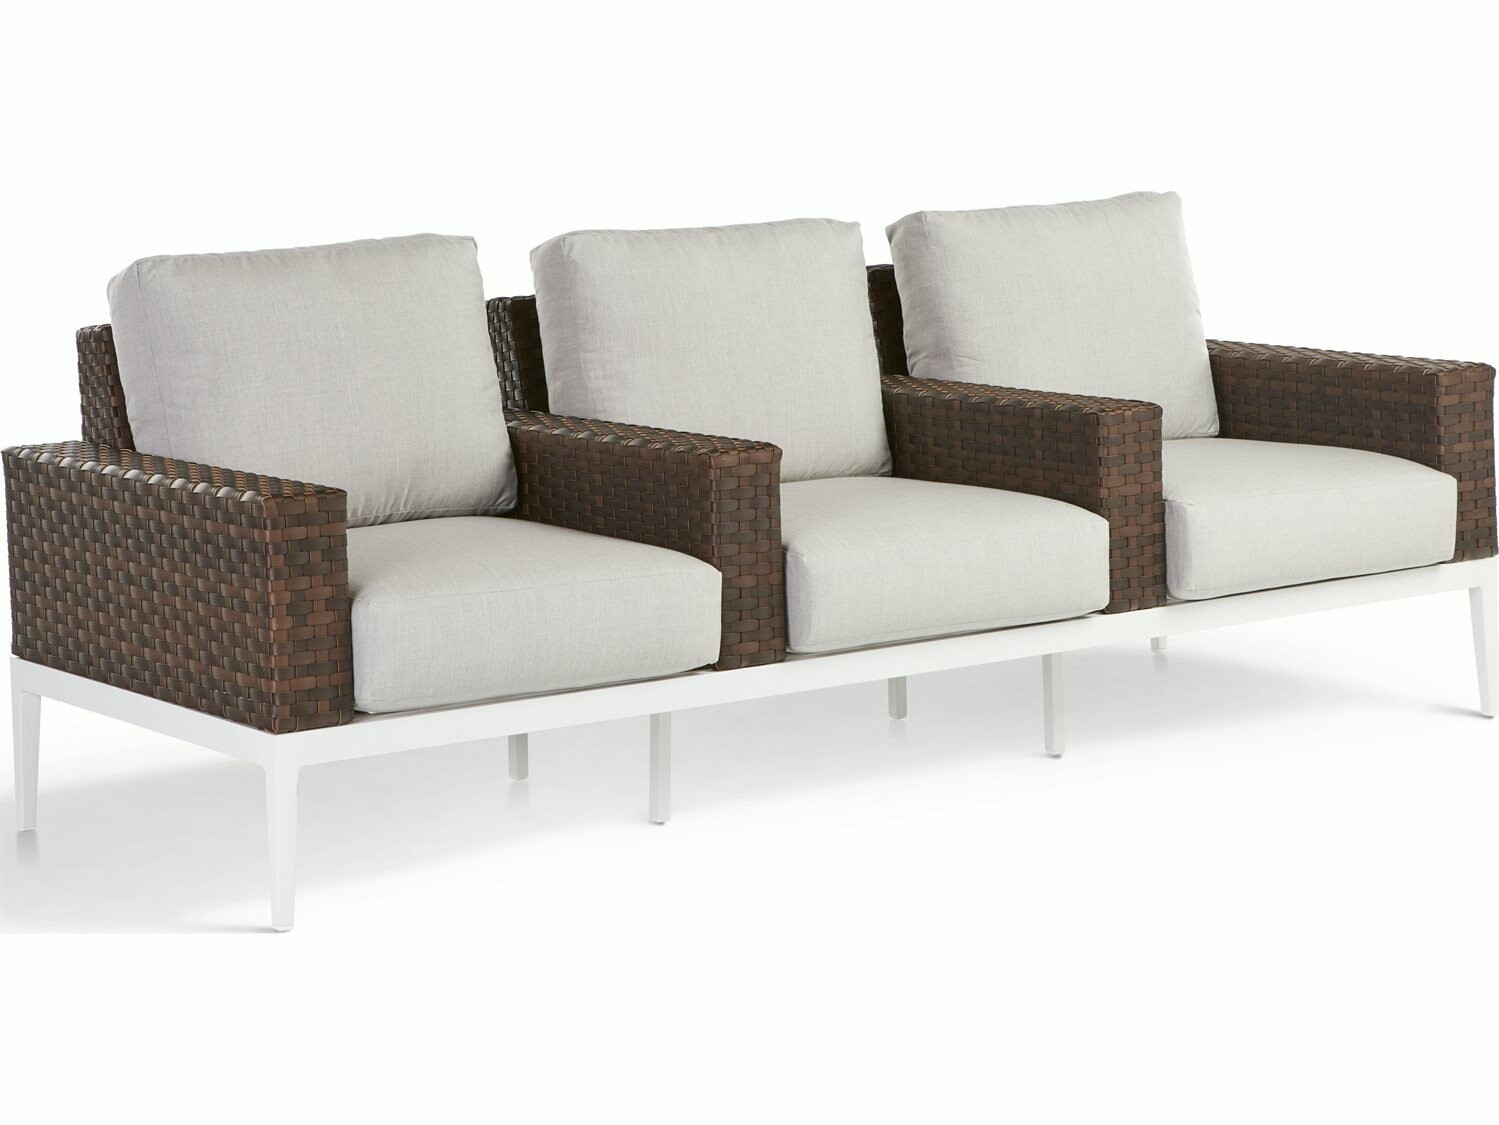 South Sea Rattan Stevie Wicker Theater - Style Sofa